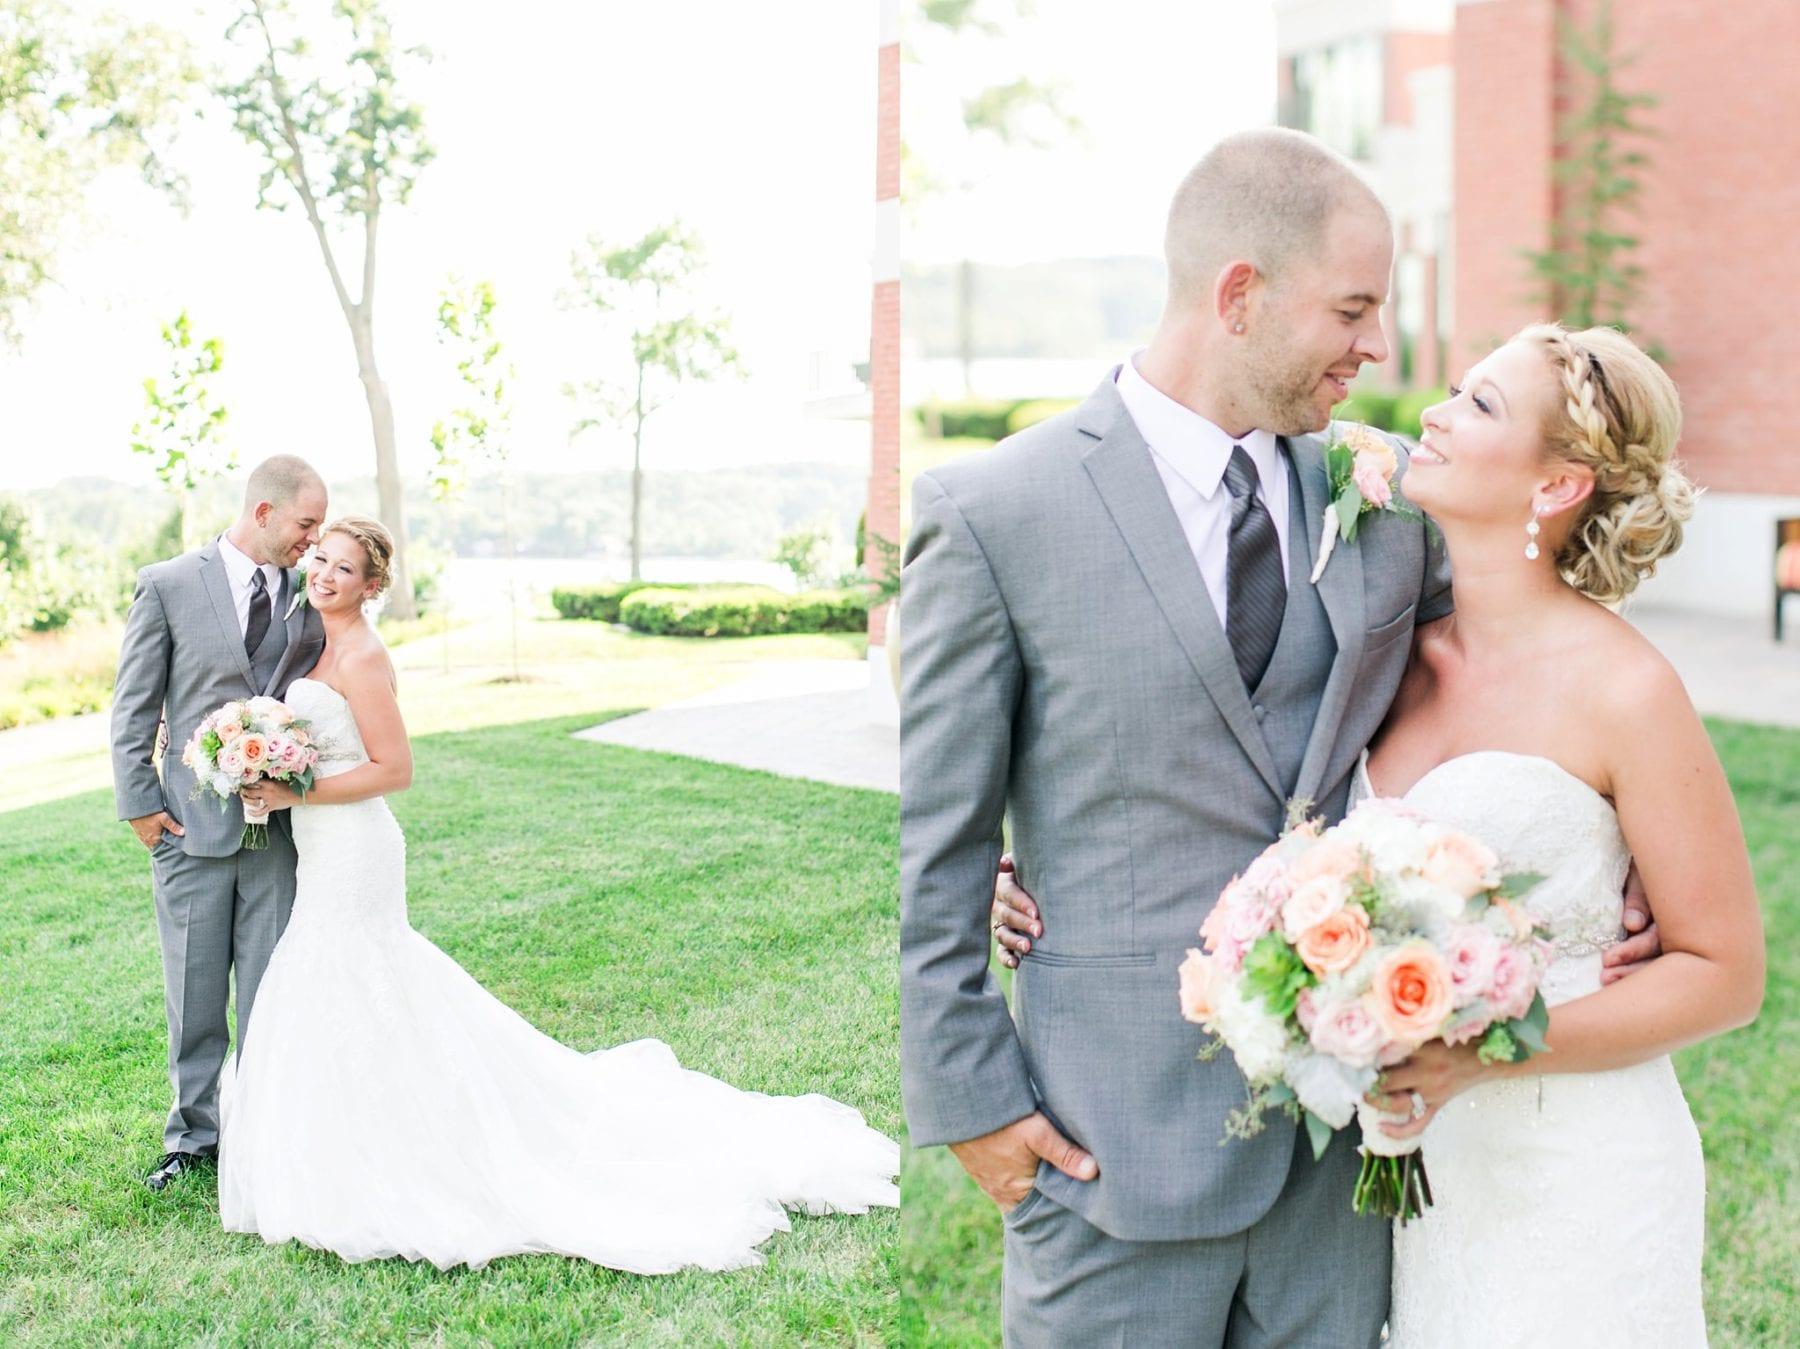 Waters Edge Wedding Photos Maryland Wedding Photographer Megan Kelsey Photography Katie & Conor-344.JPG